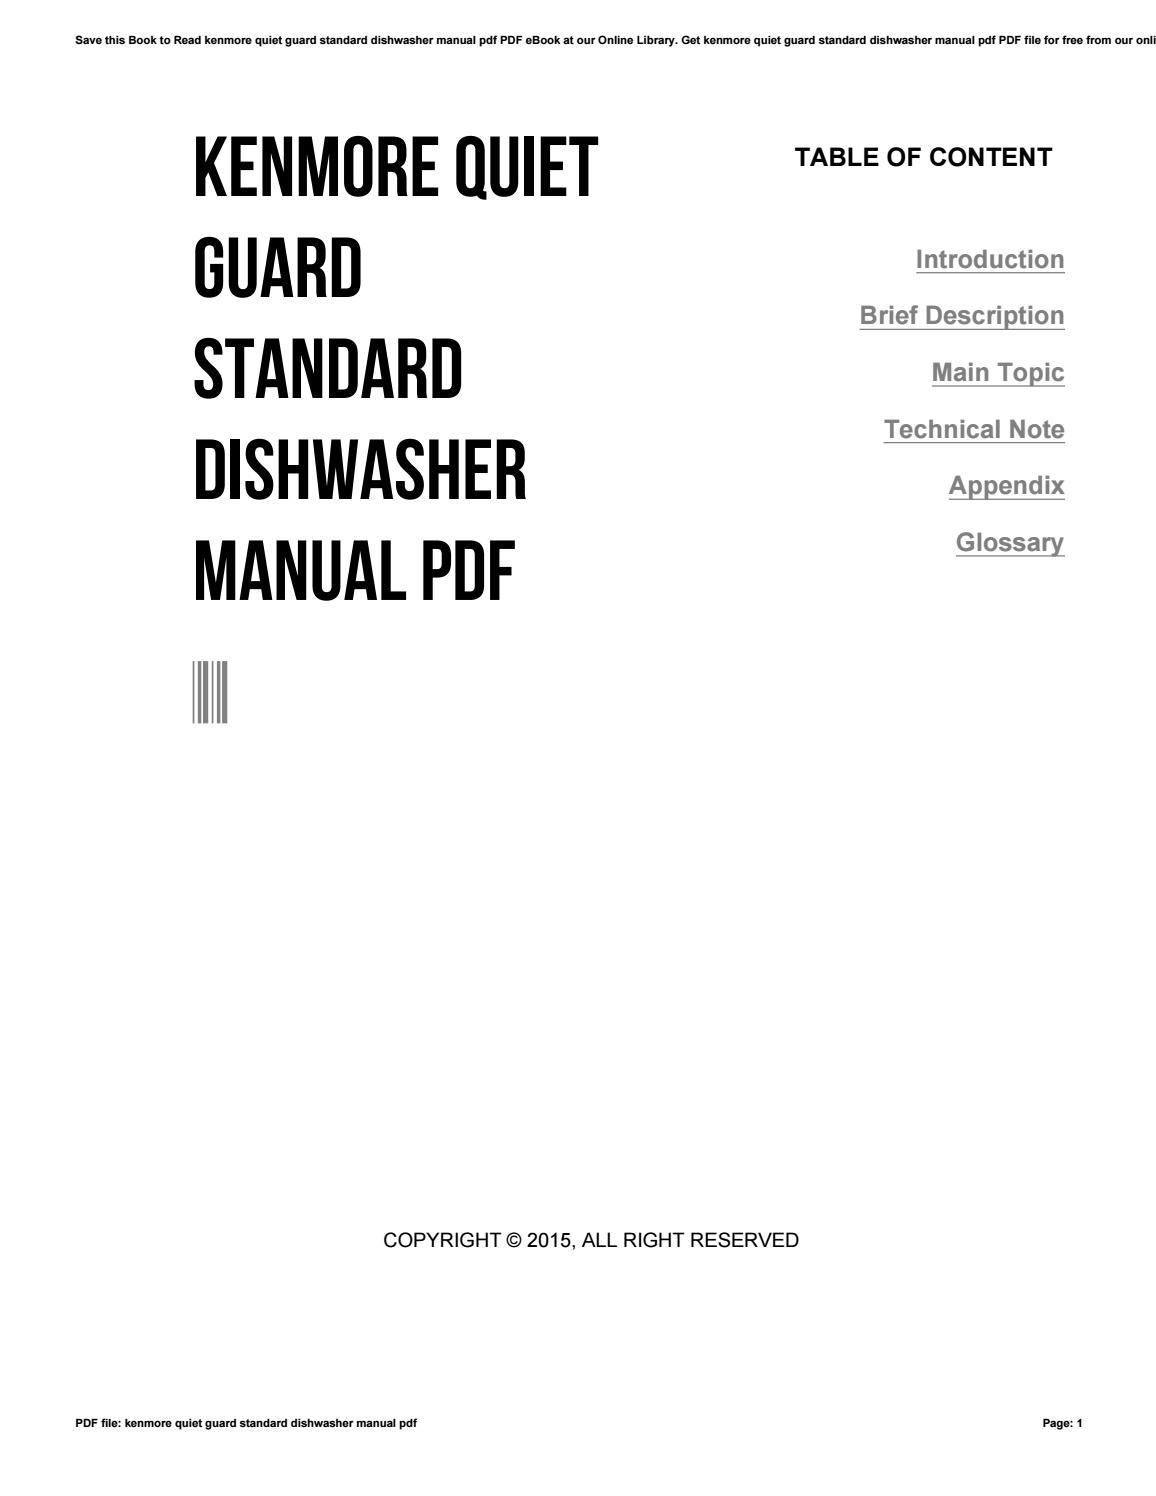 kenmore quietguard standard dishwasher manual